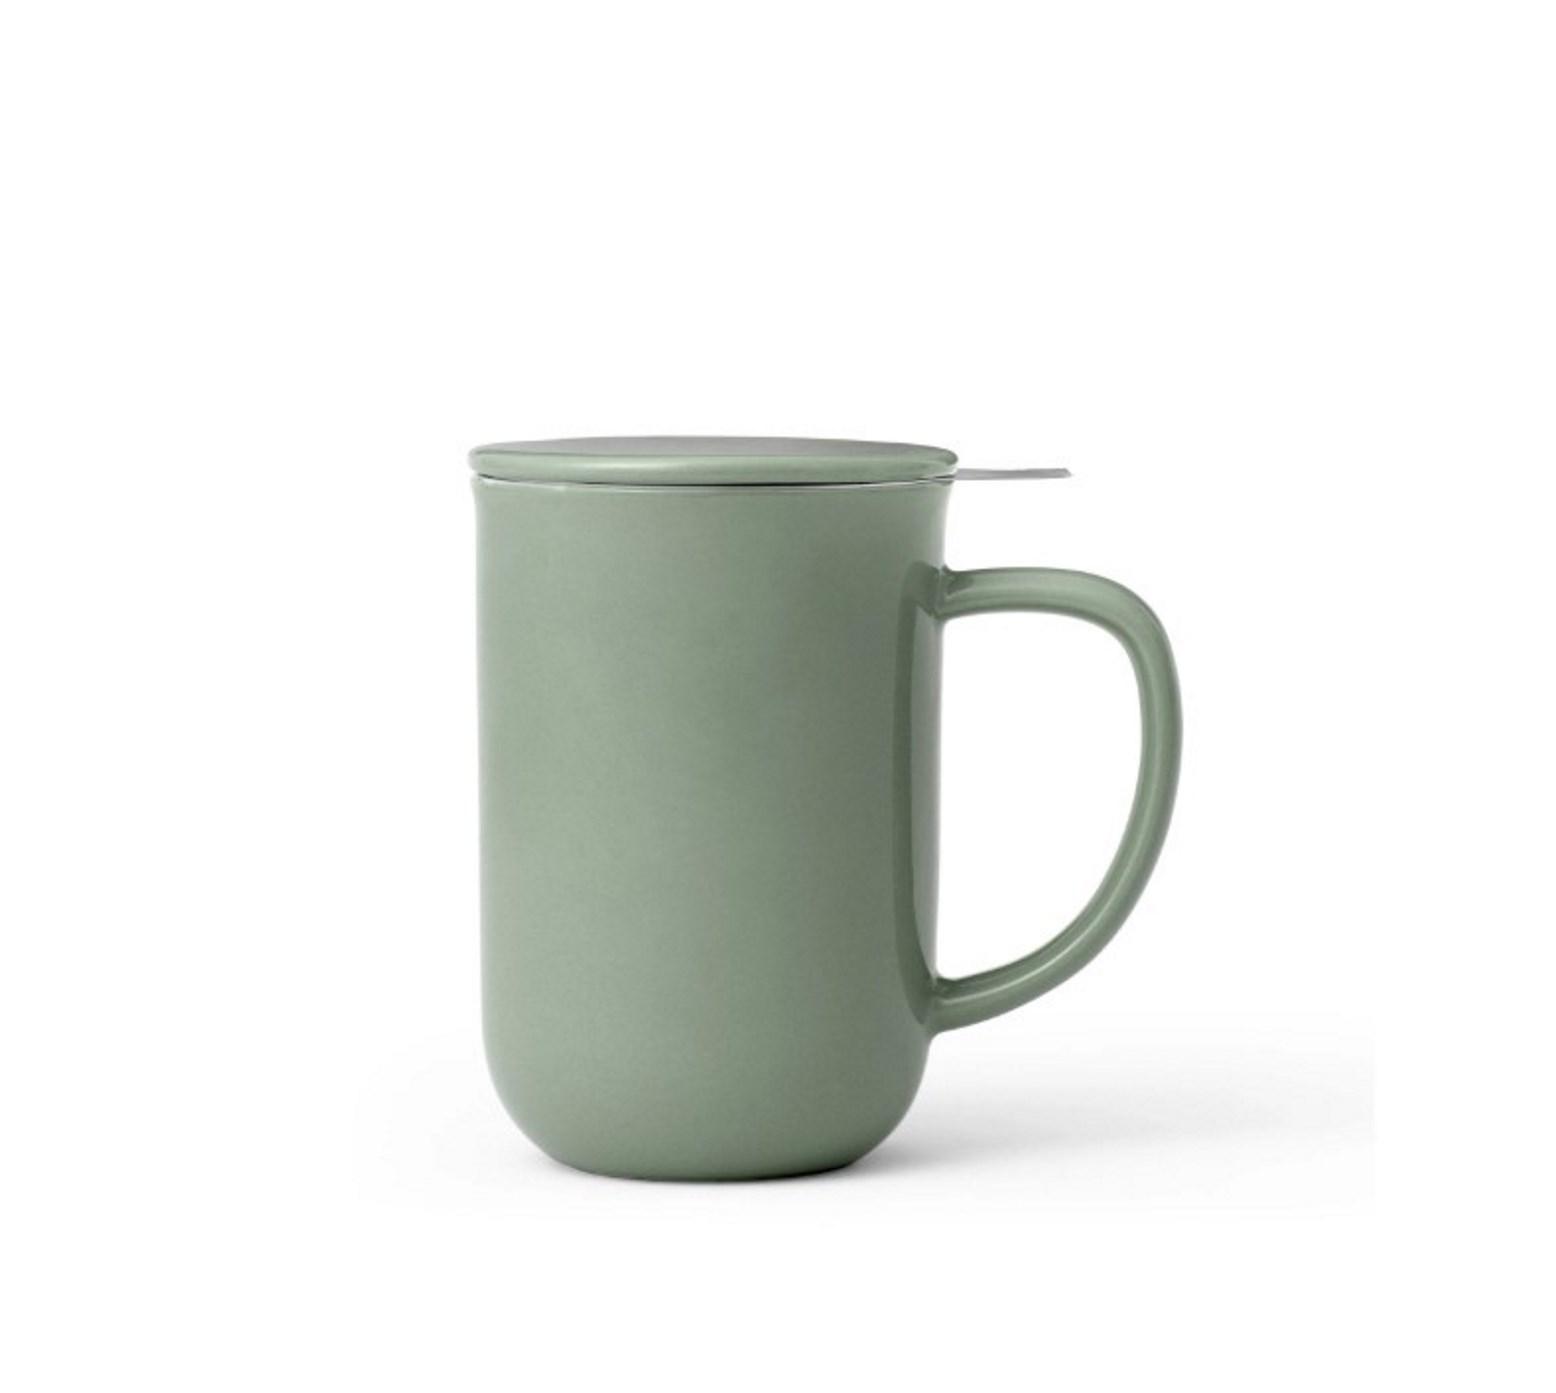 Онлайн каталог PROMENU: Кружка для чая с ситечком Viva Scandinavia MINIMA Stone green, объем 0,55 л, зеленый                               V77546